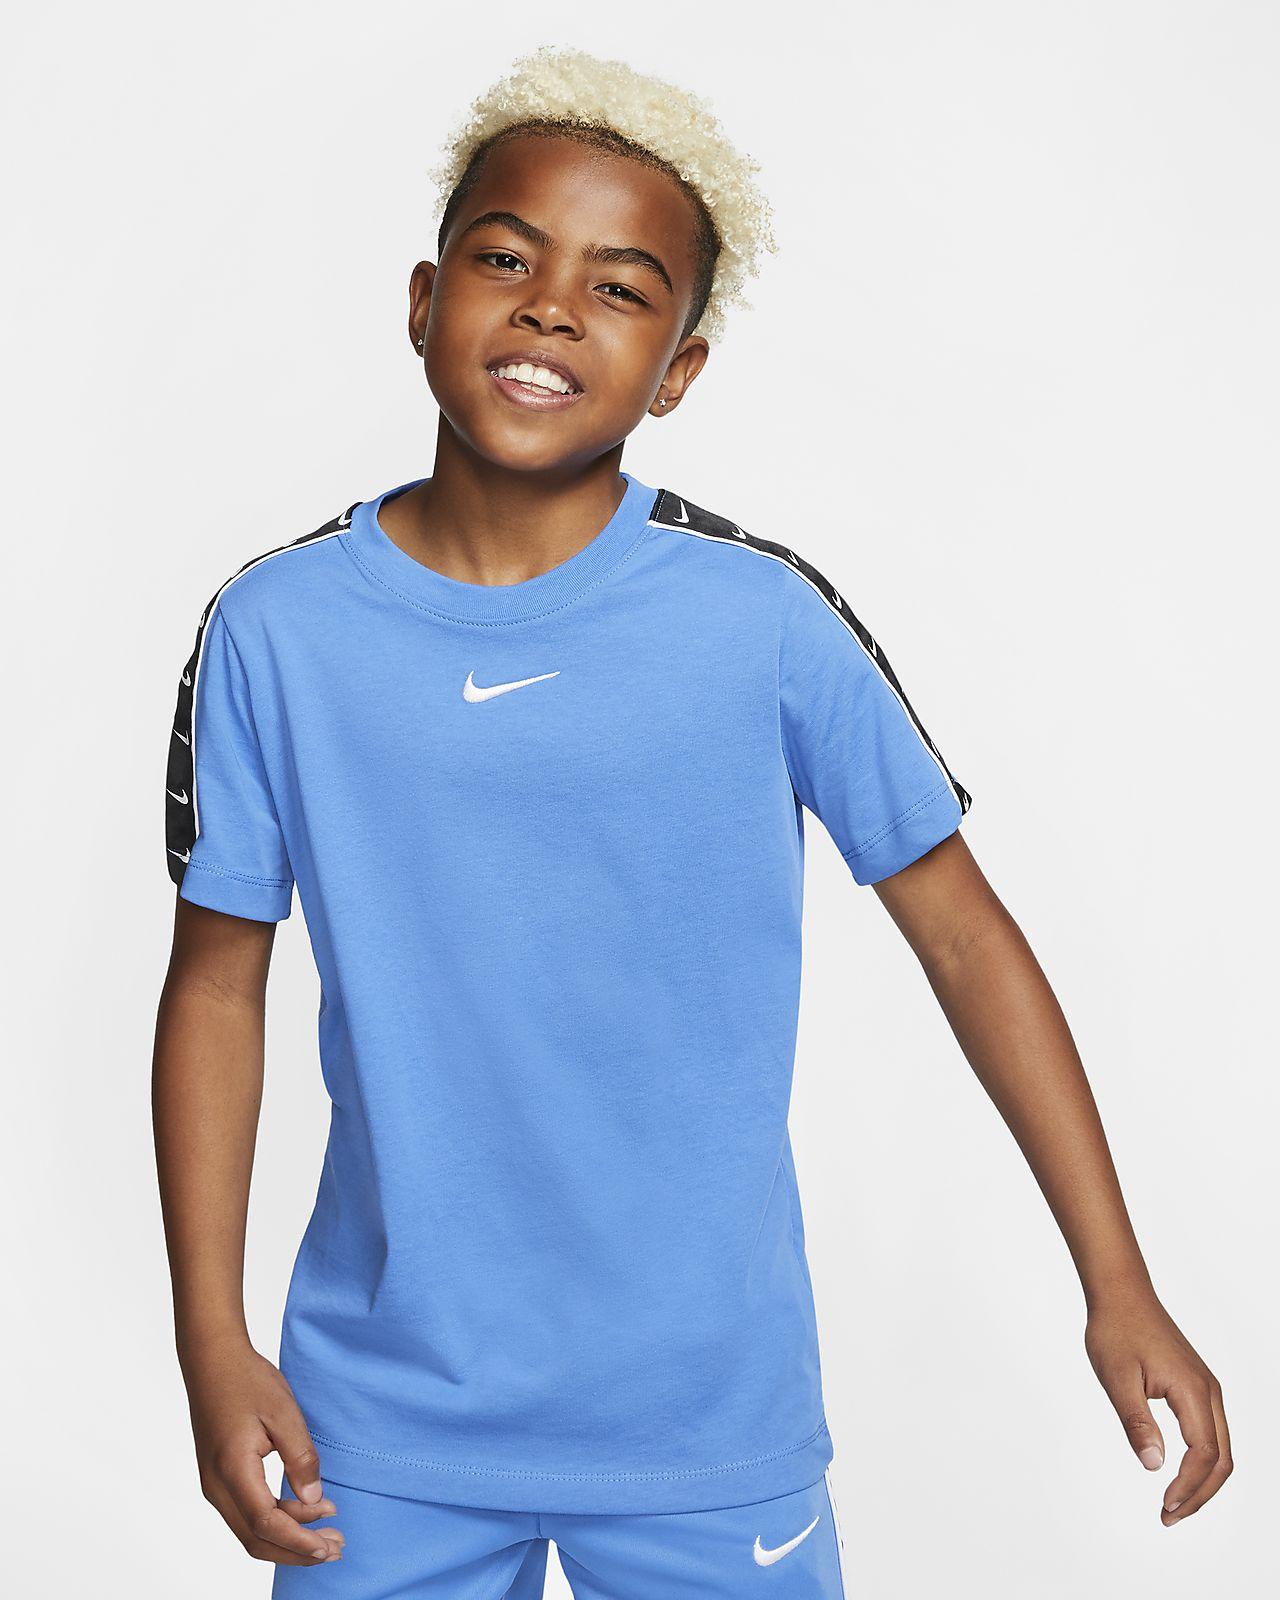 Nike Sportswear Swoosh T-Shirt für ältere Kinder